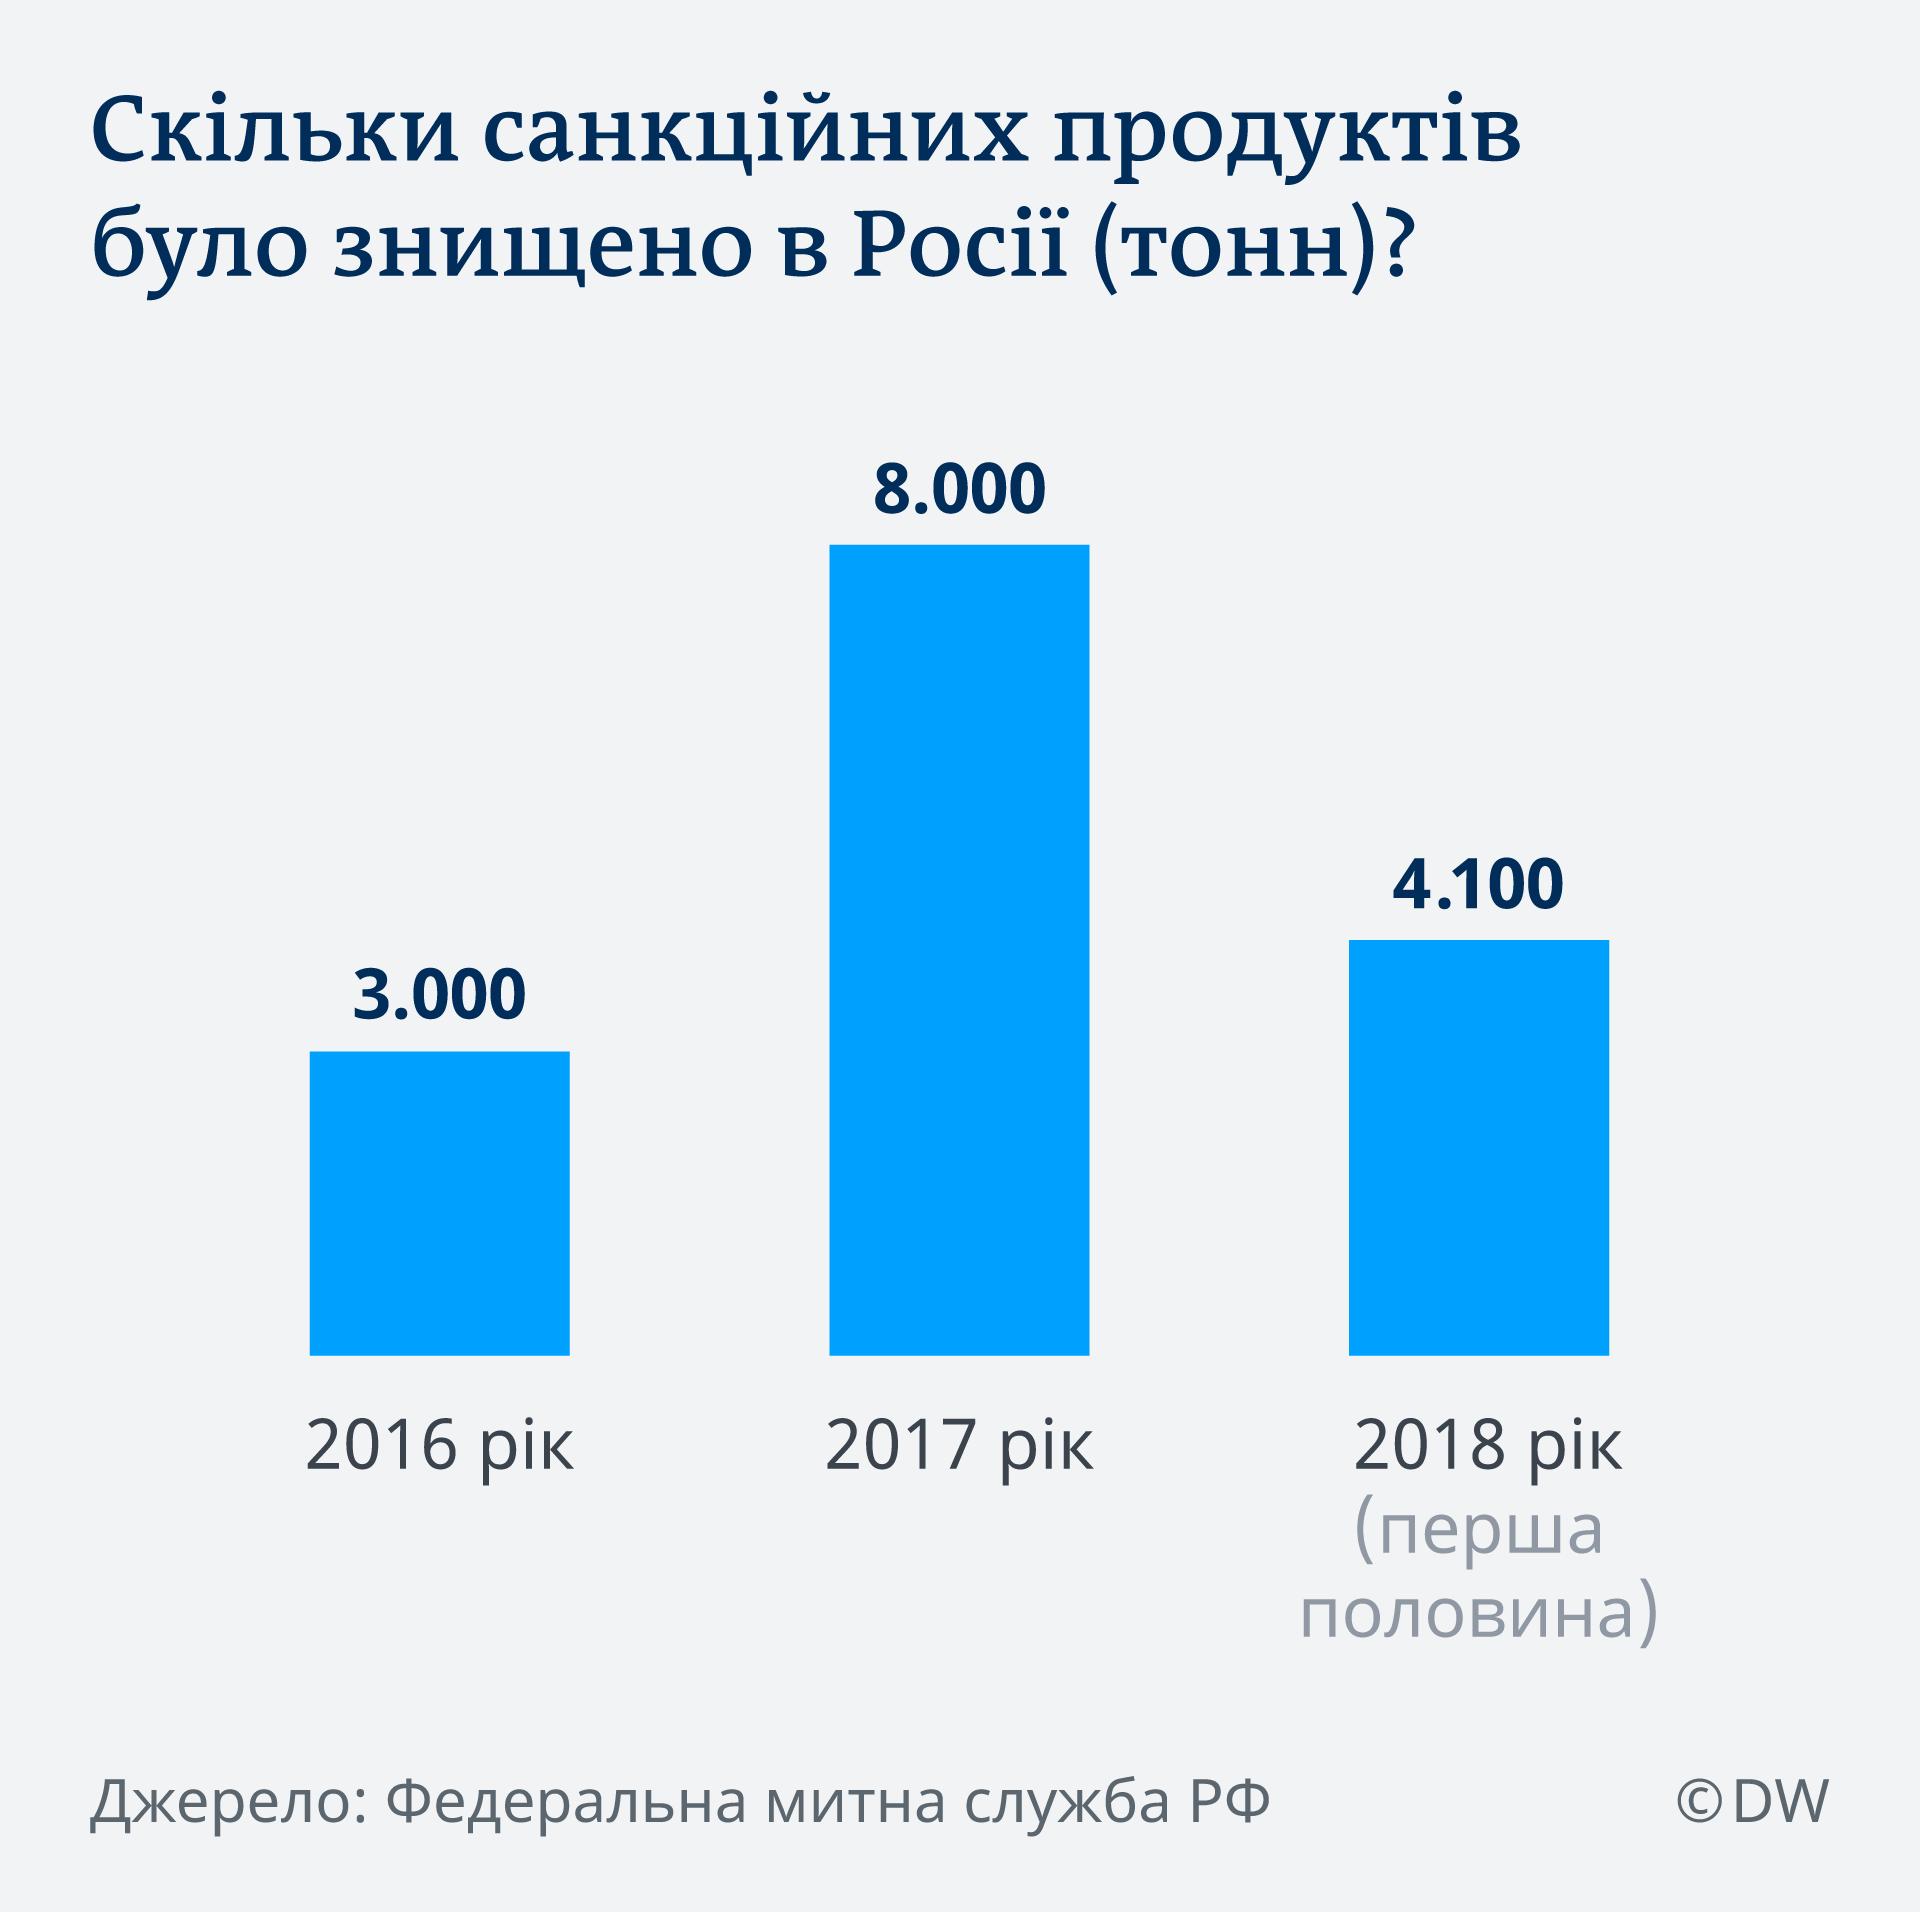 Infografik Zerstörte Sanktionsprodukte Russland UK